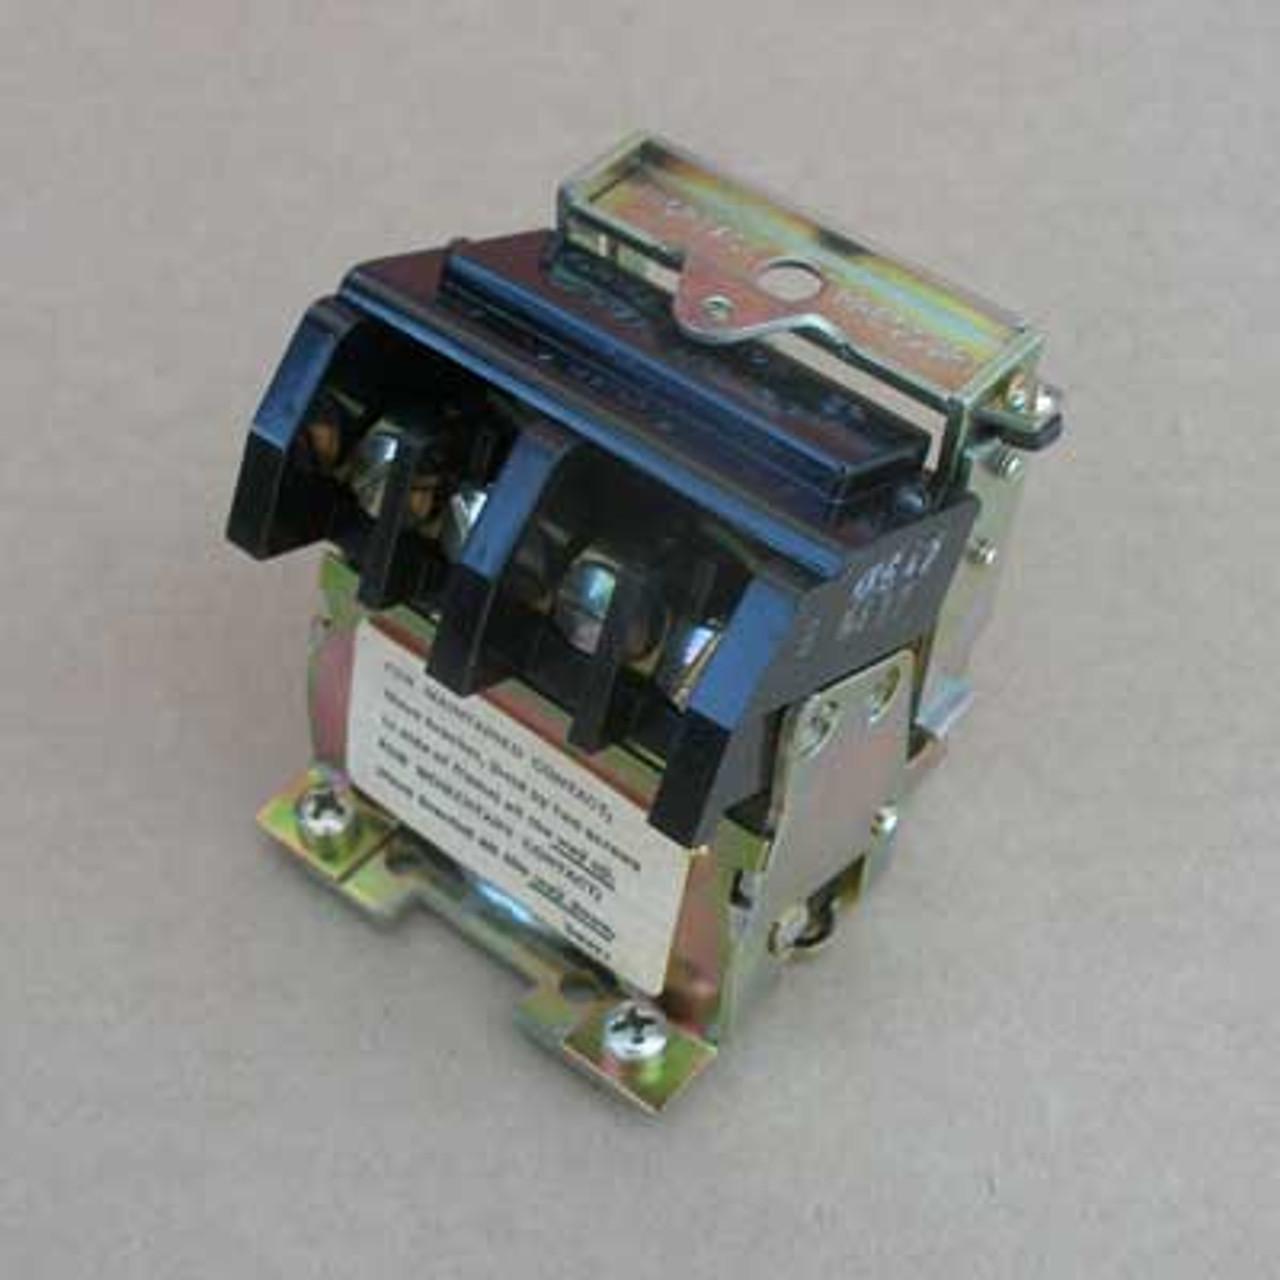 Furnas L191 Pressure Switch Mechanism